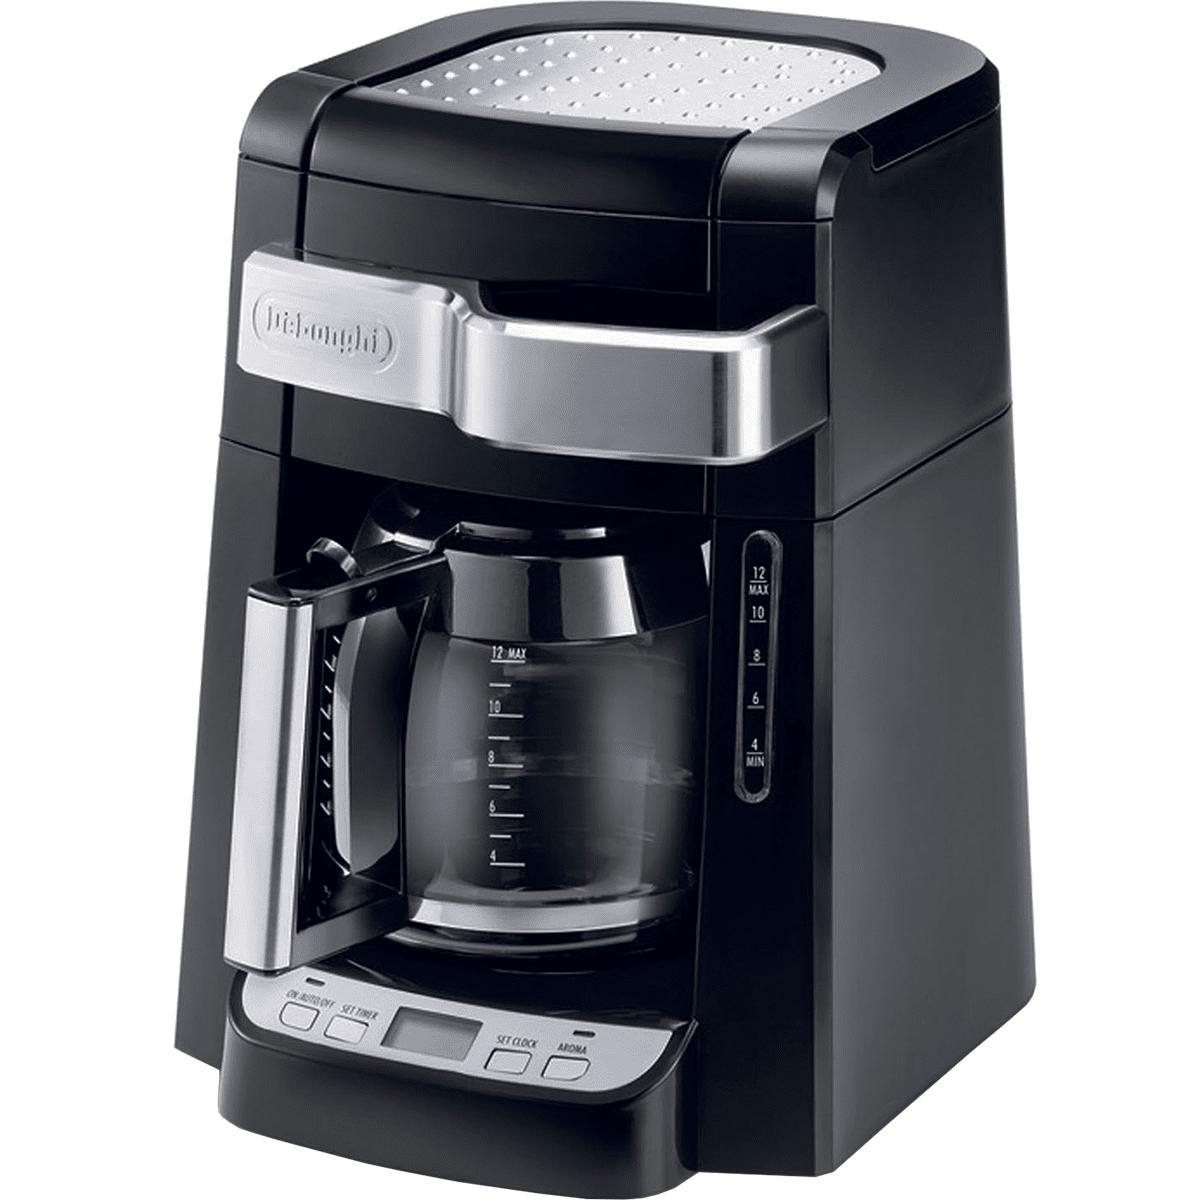 DeLonghi 12 Cup Programmable Coffee Maker DCF2212T